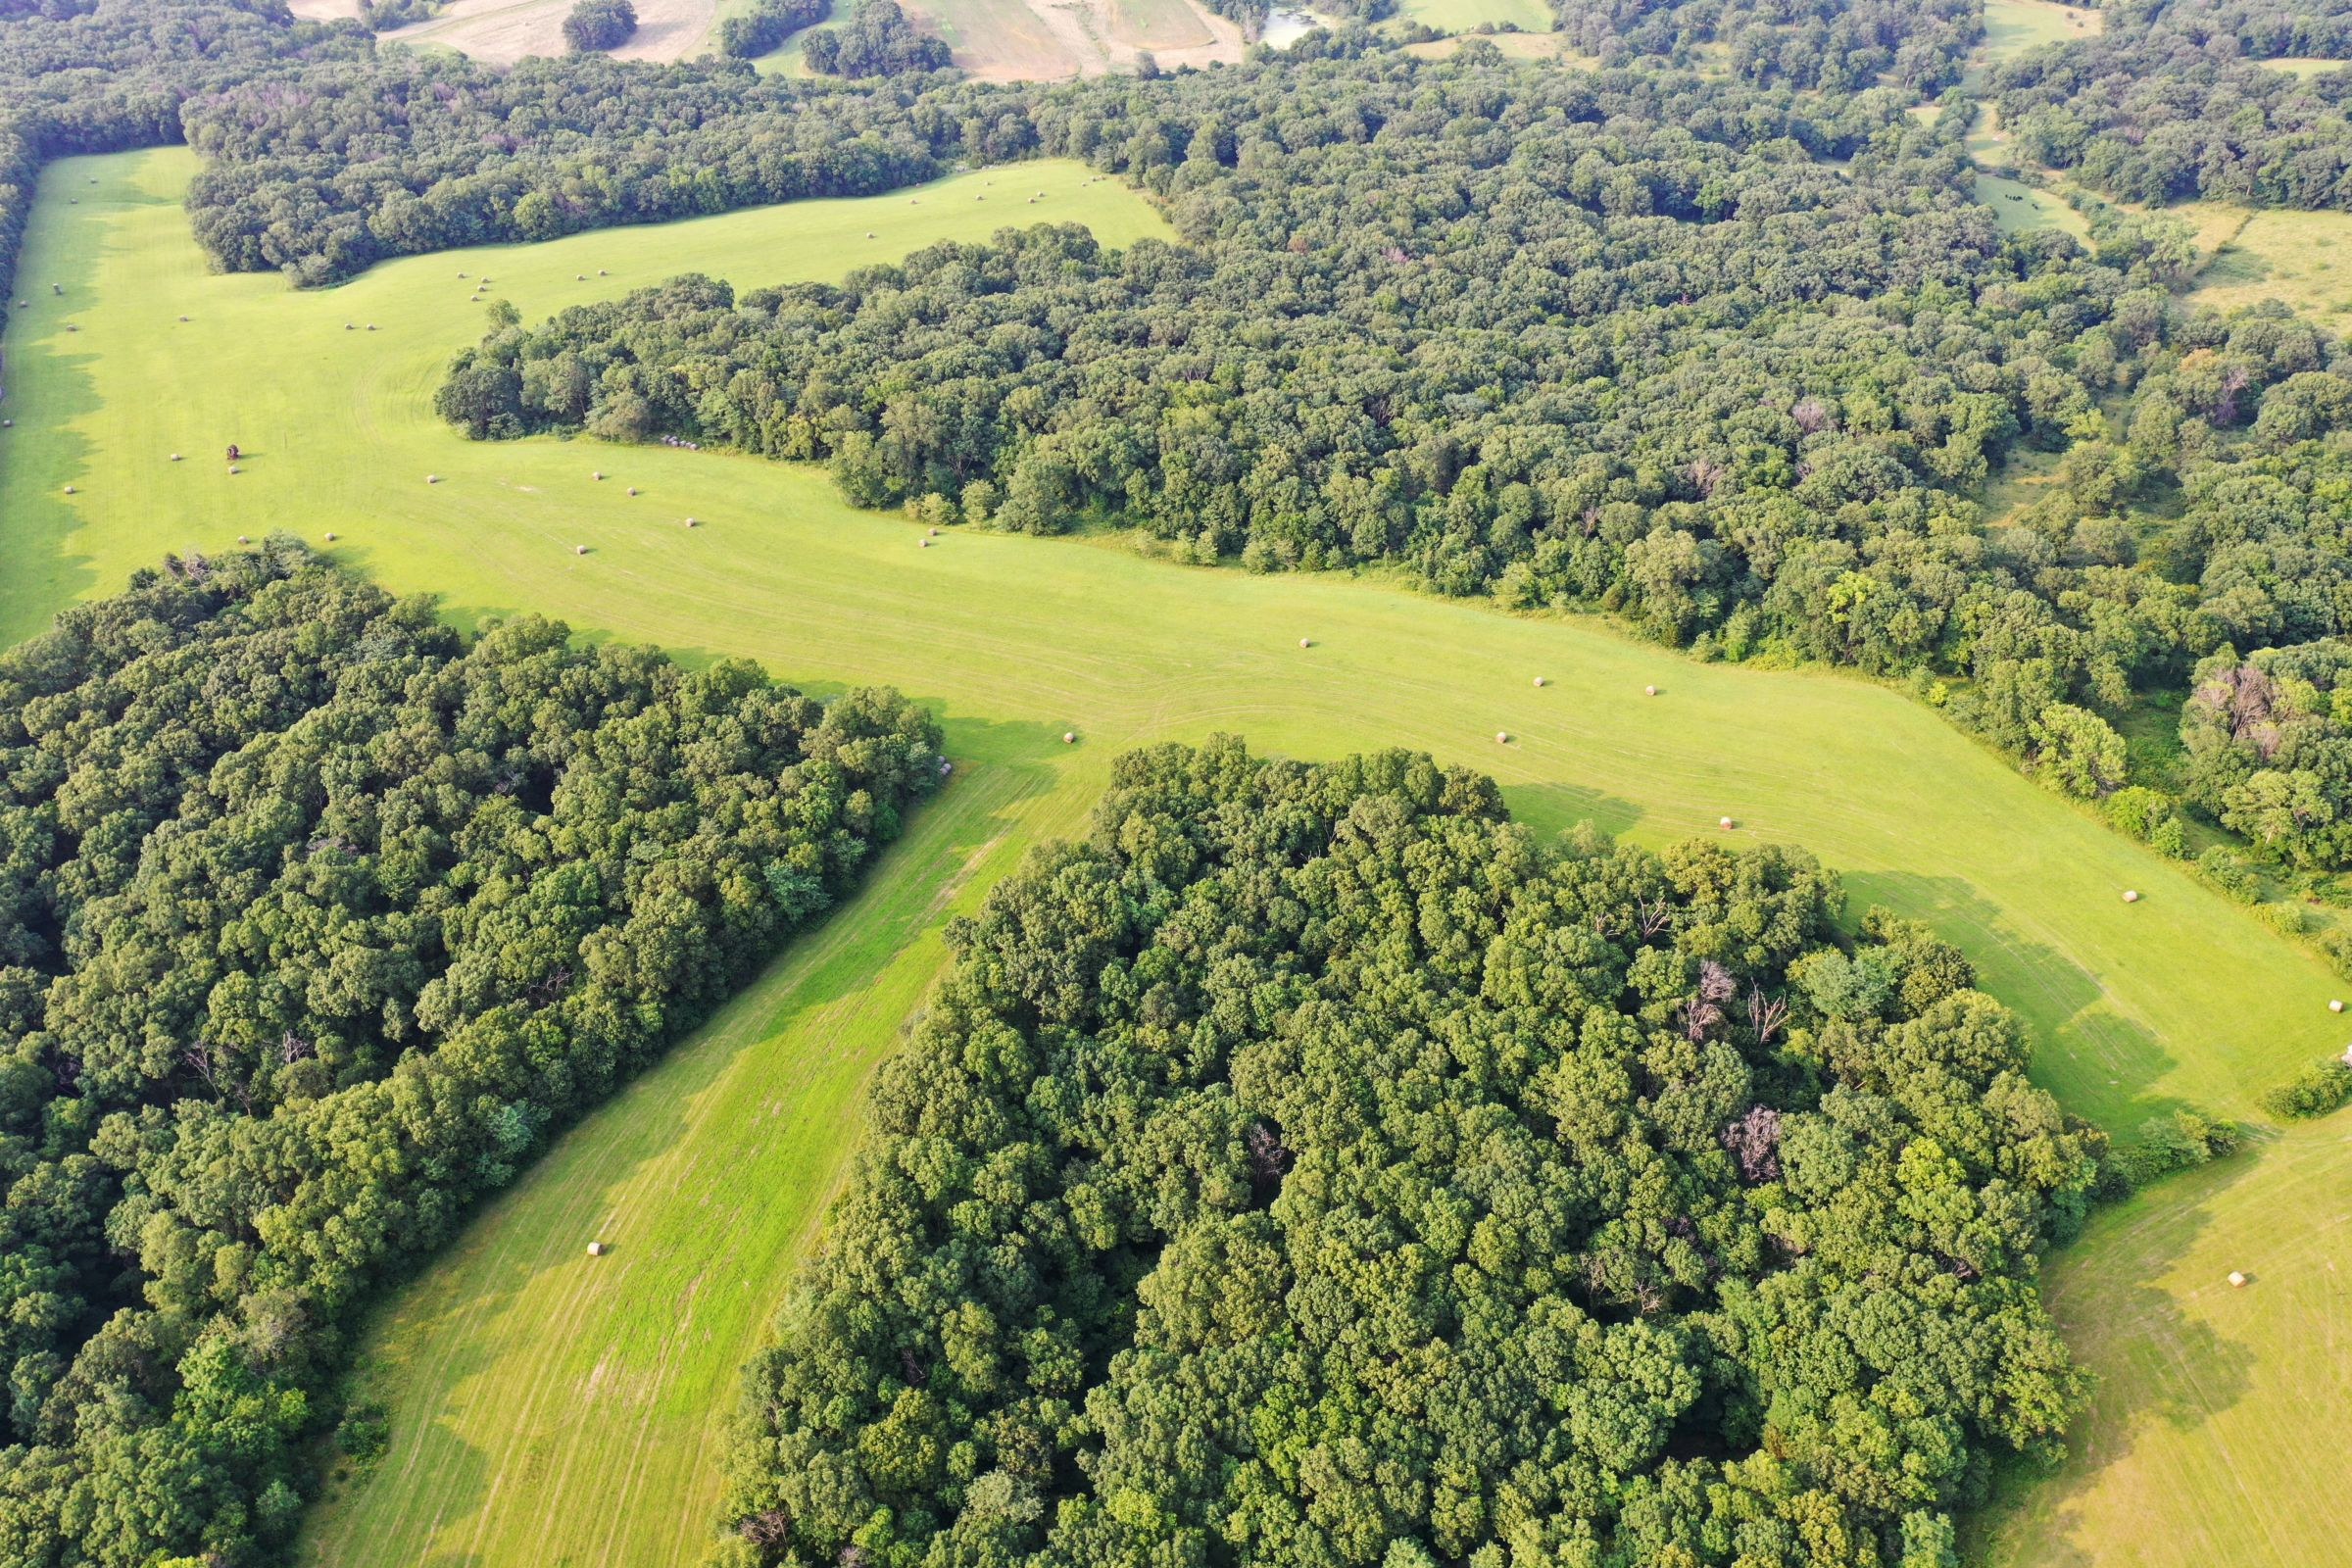 land-lee-county-iowa-340-acres-listing-number-15649-2-2021-07-21-185907.jpg